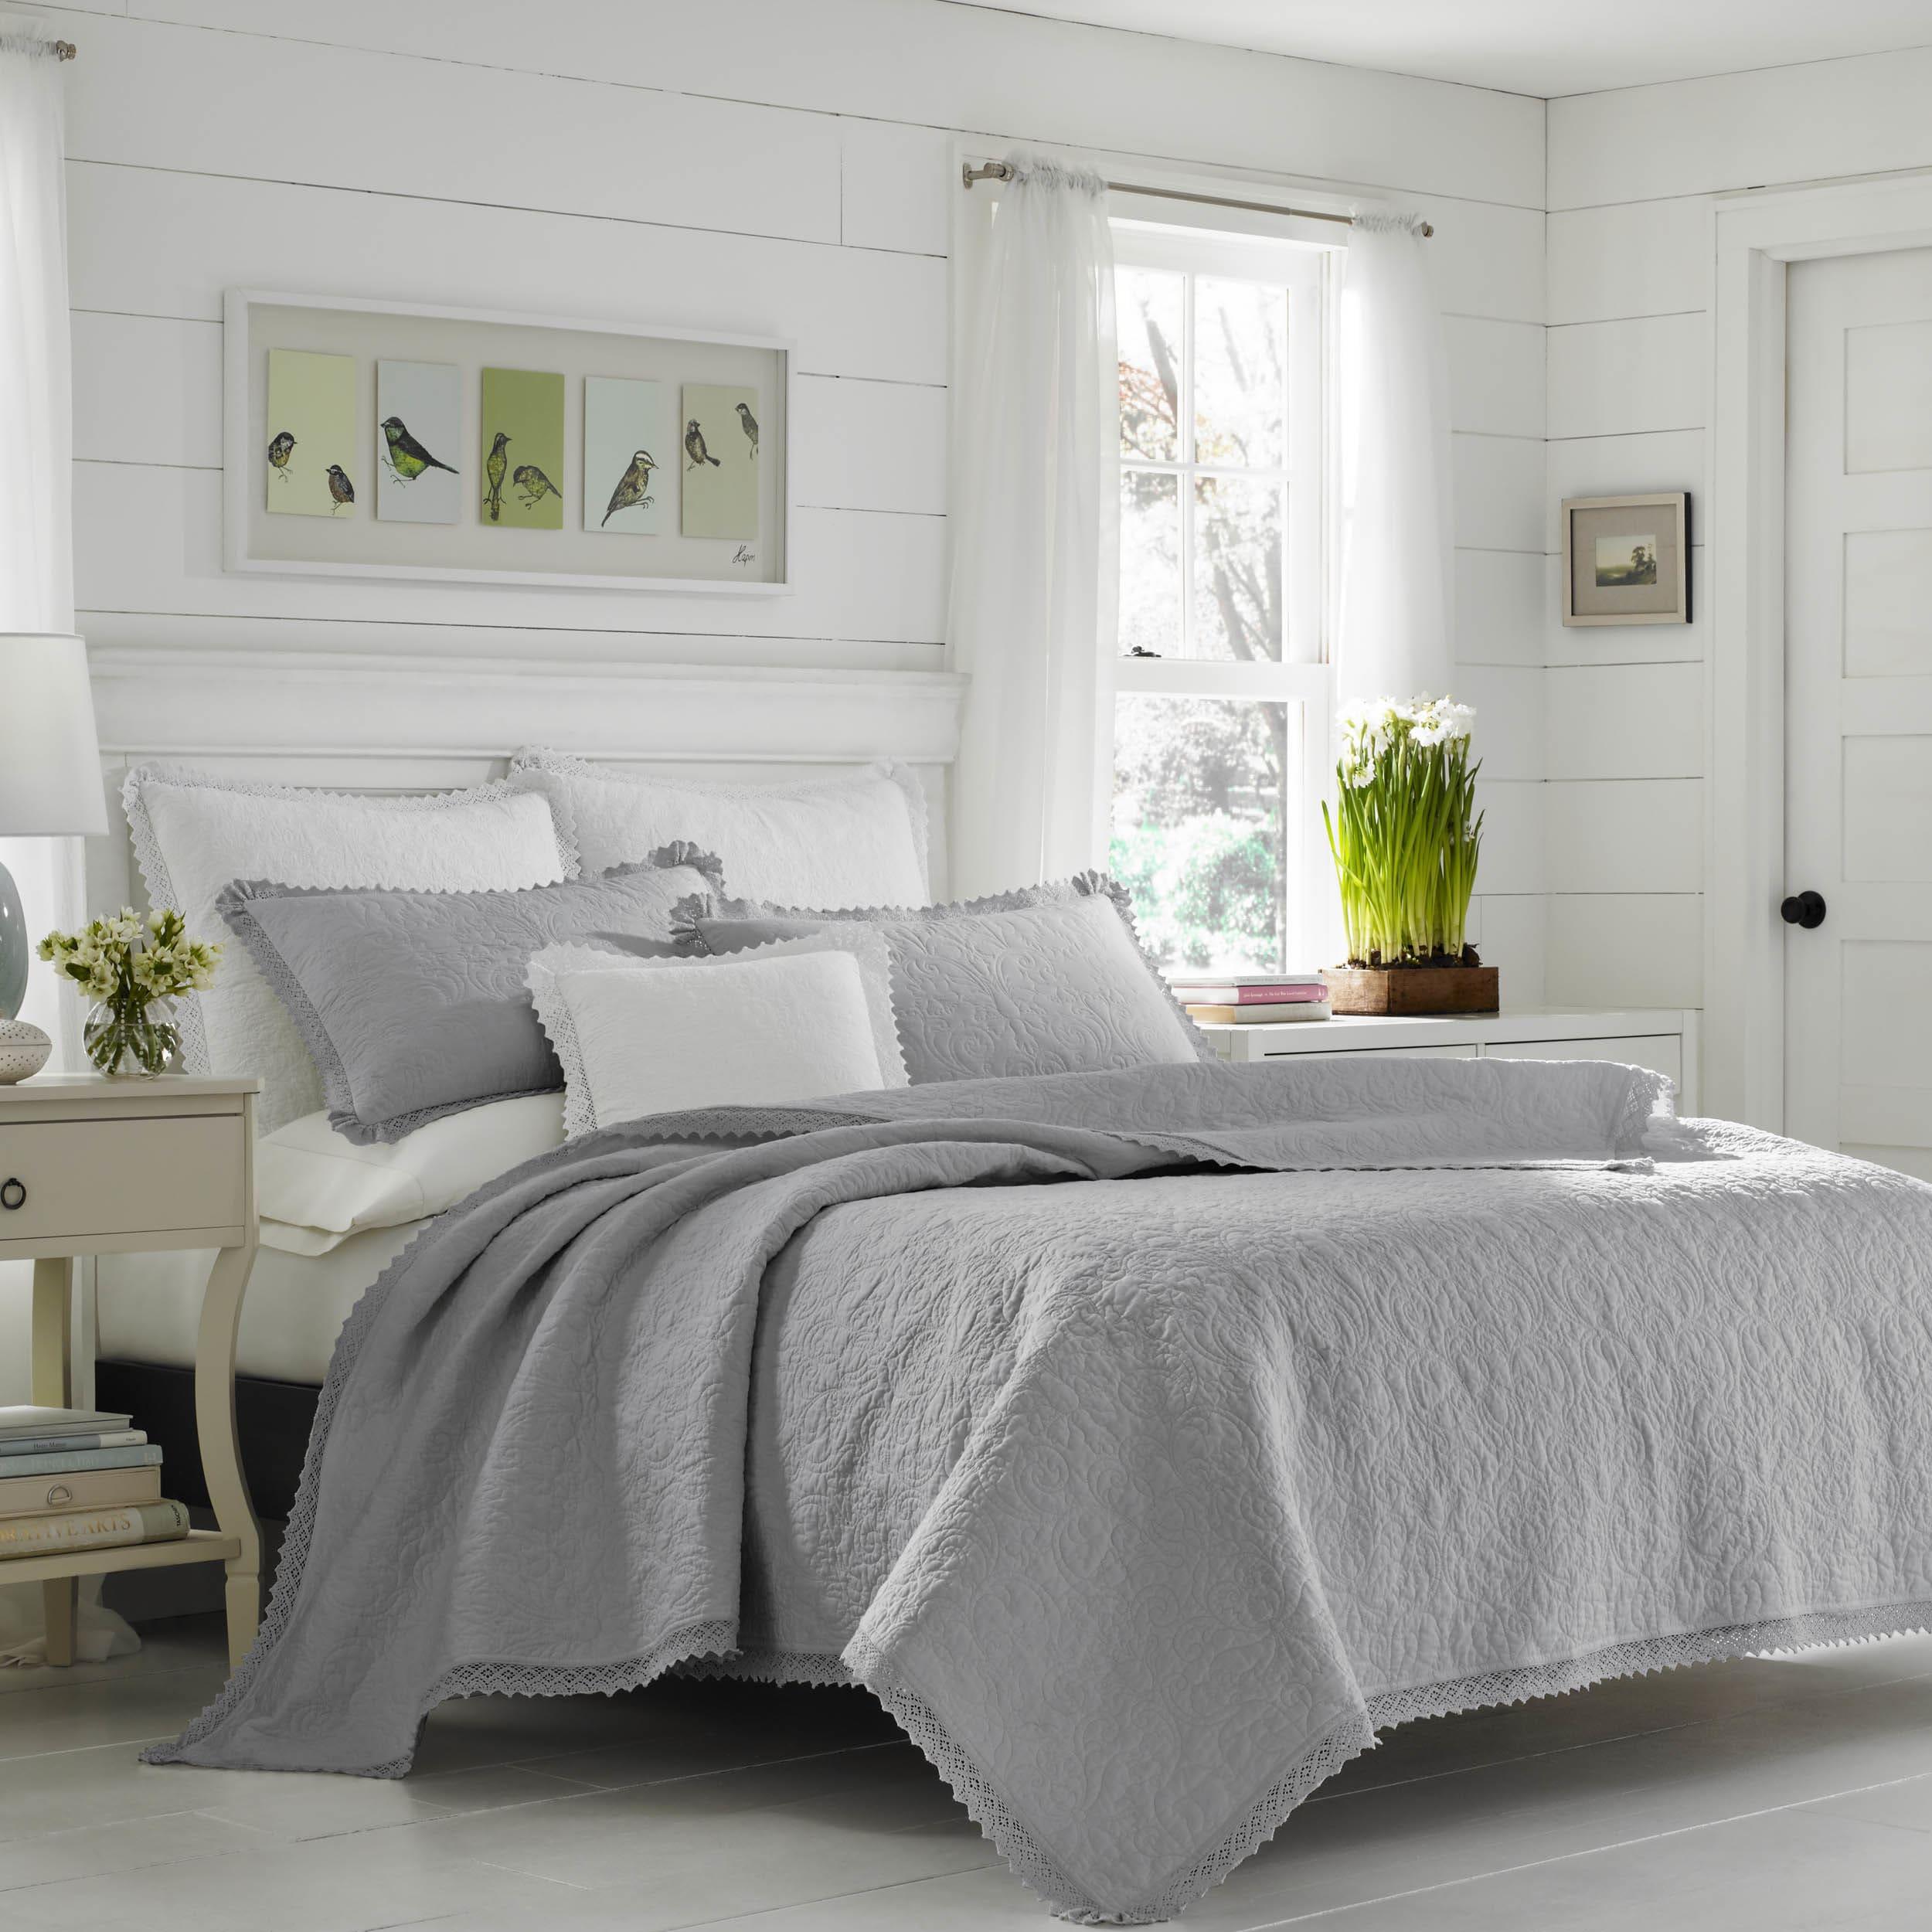 Laura Ashley Heirloom Crochet Grey Quilt Set (King) (Cott...